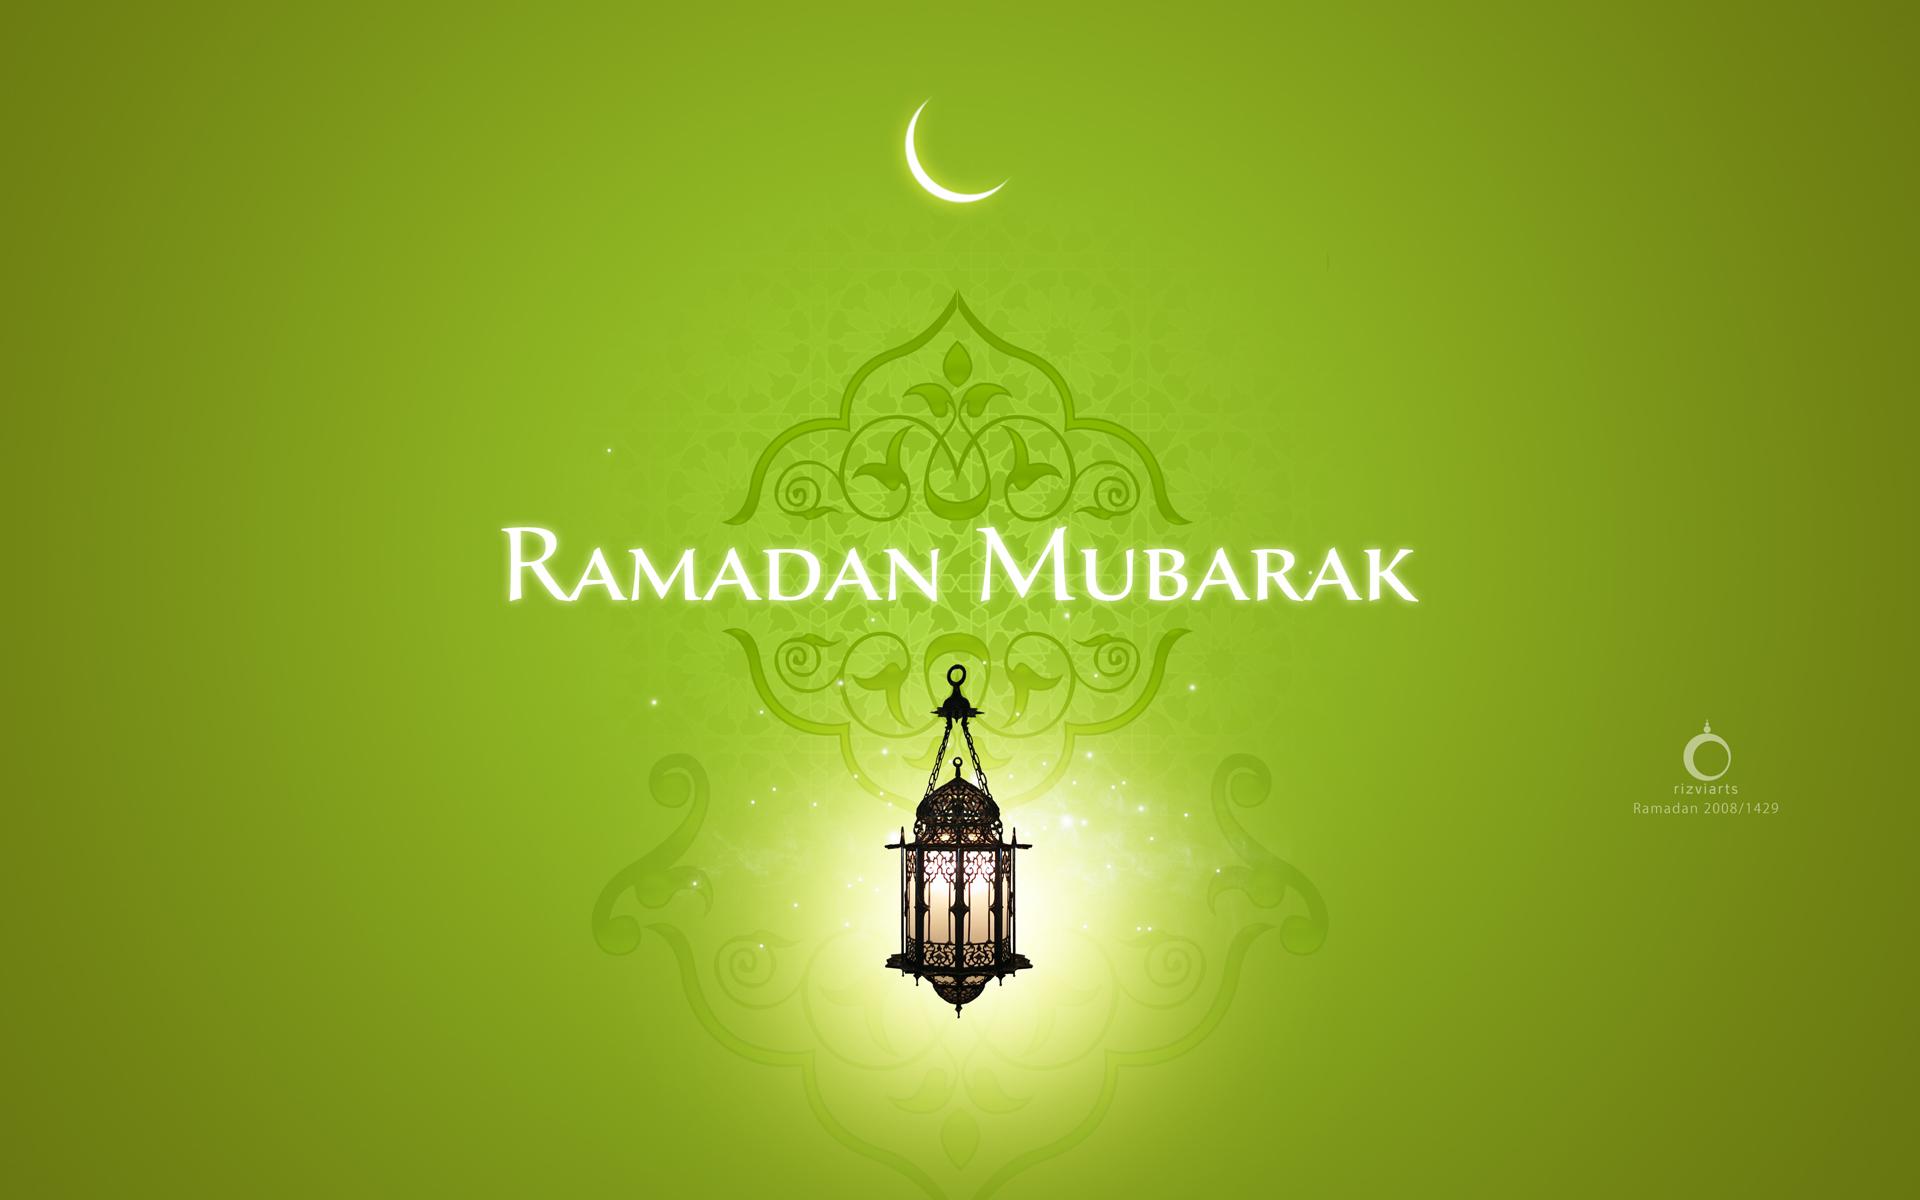 Ramadan ultra hd